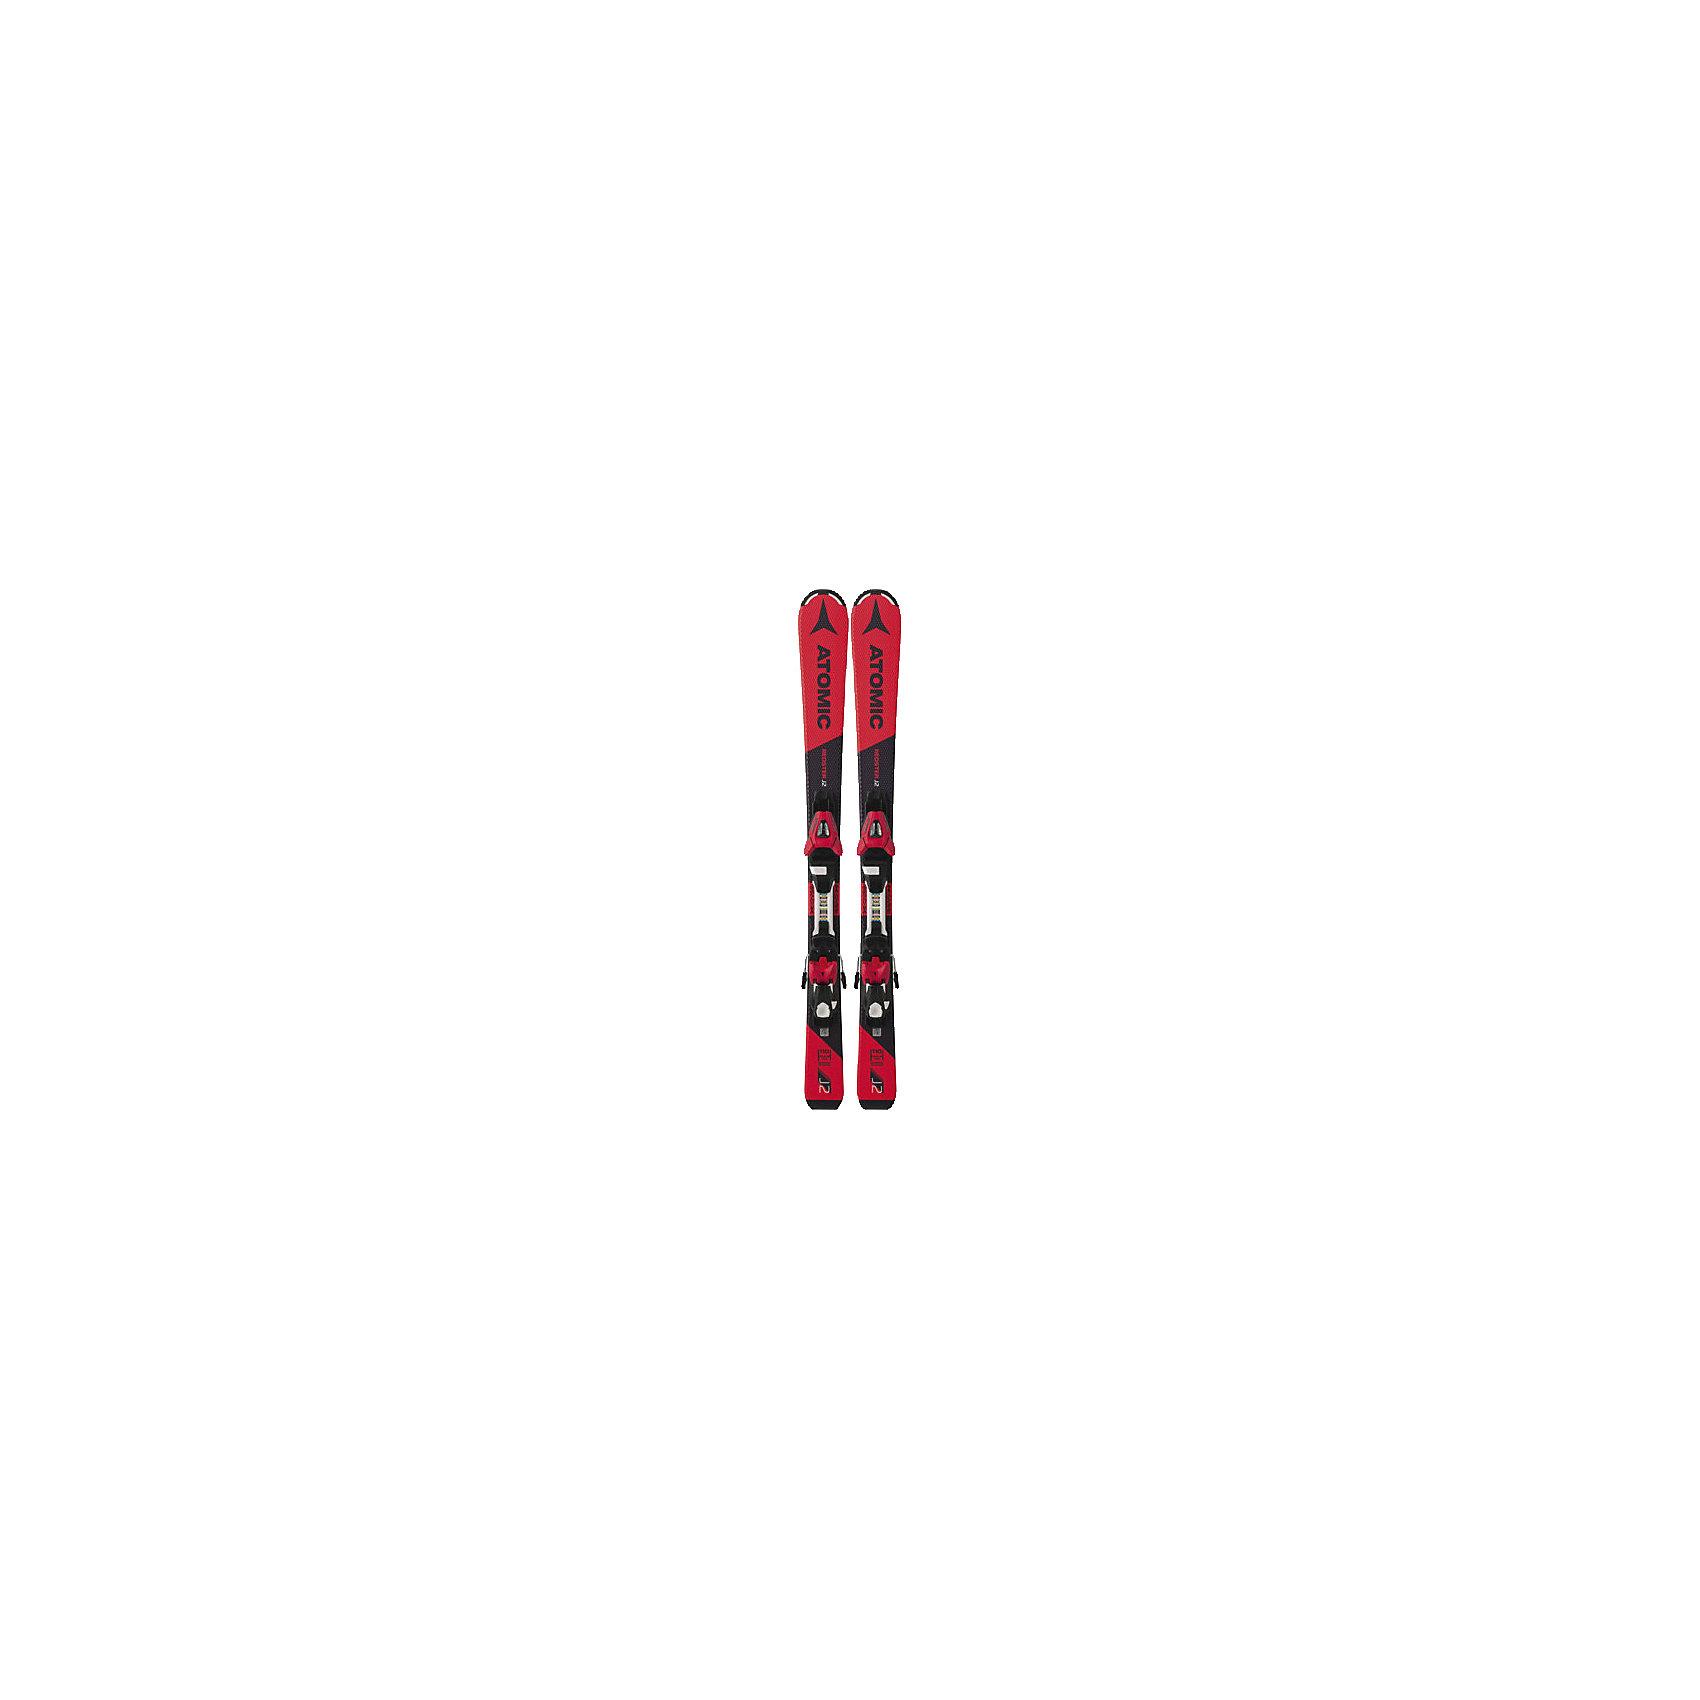 Neu Atomic Skiset ROTster  J2 C 5 SR 7146180 rot rot 7146180 3f9456